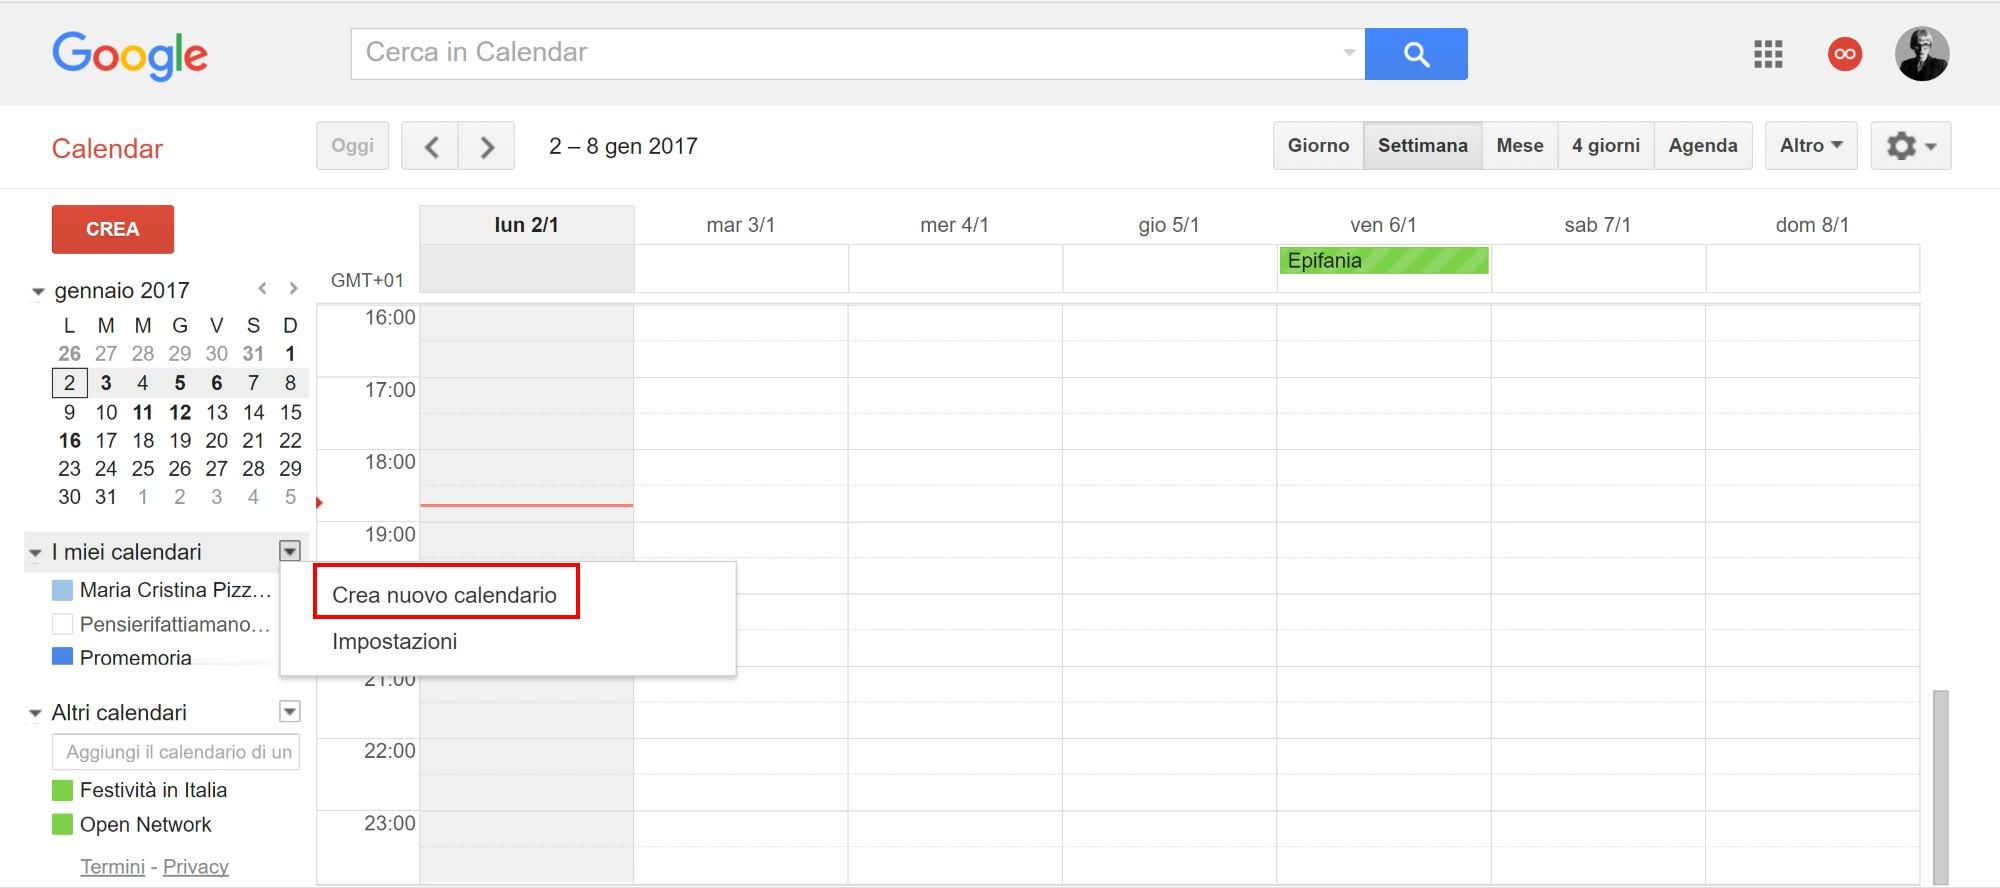 CalendarioGoogle-istruzioni-templeta-calendario-editoriale